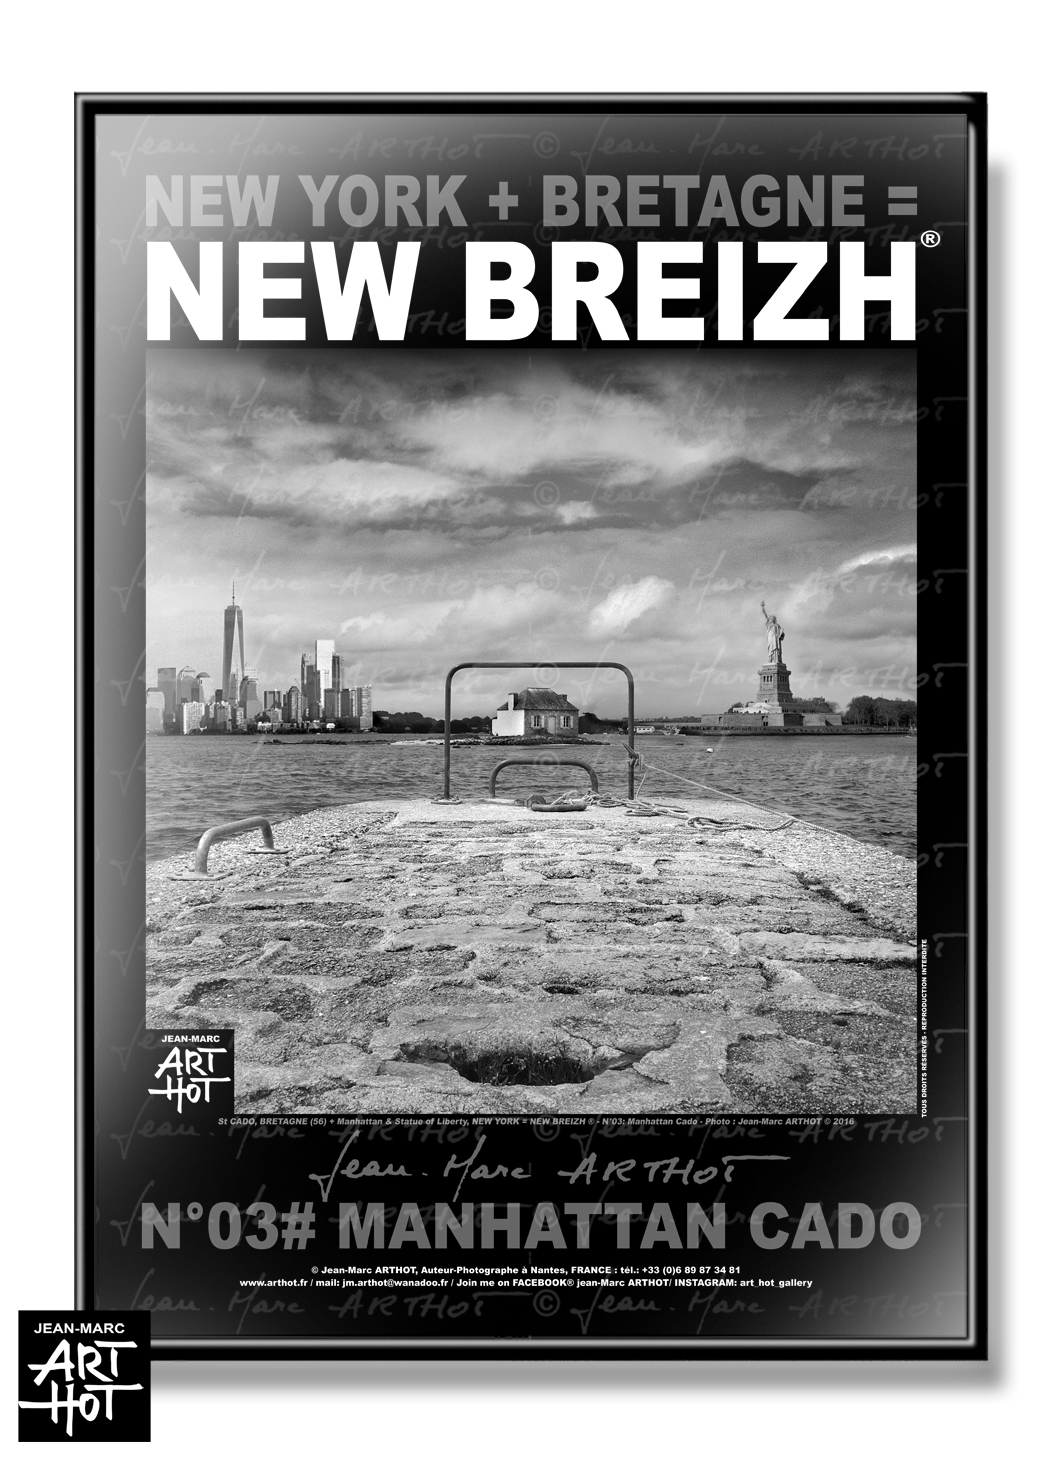 AFFICHE NEW BREIZH N°03-Manhattan Cado